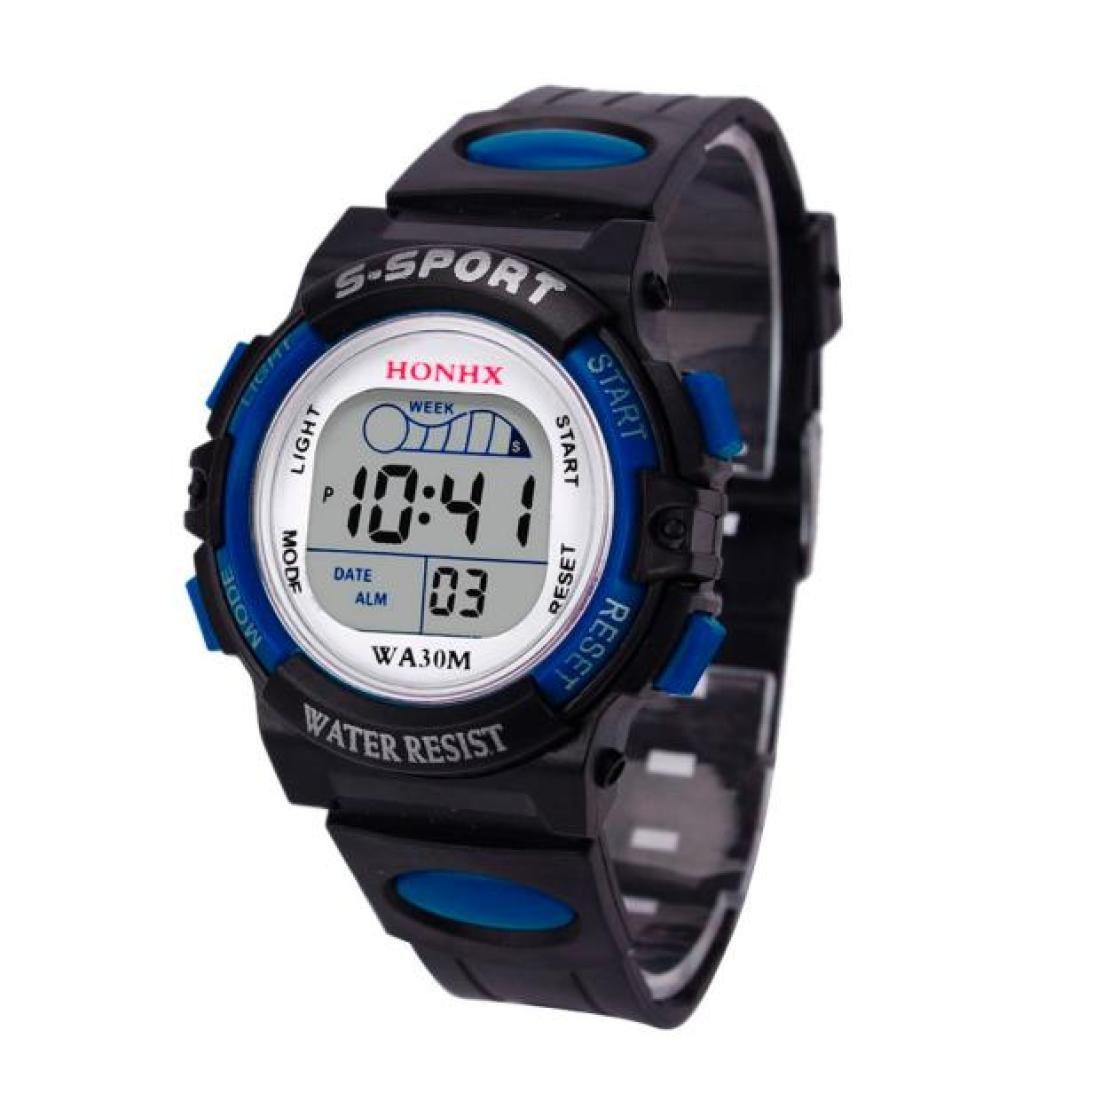 Hemlock Childrens Boys Waterproof LED Digital Calendar Watches Silicone Alarm Sports Wrist Watch Blue